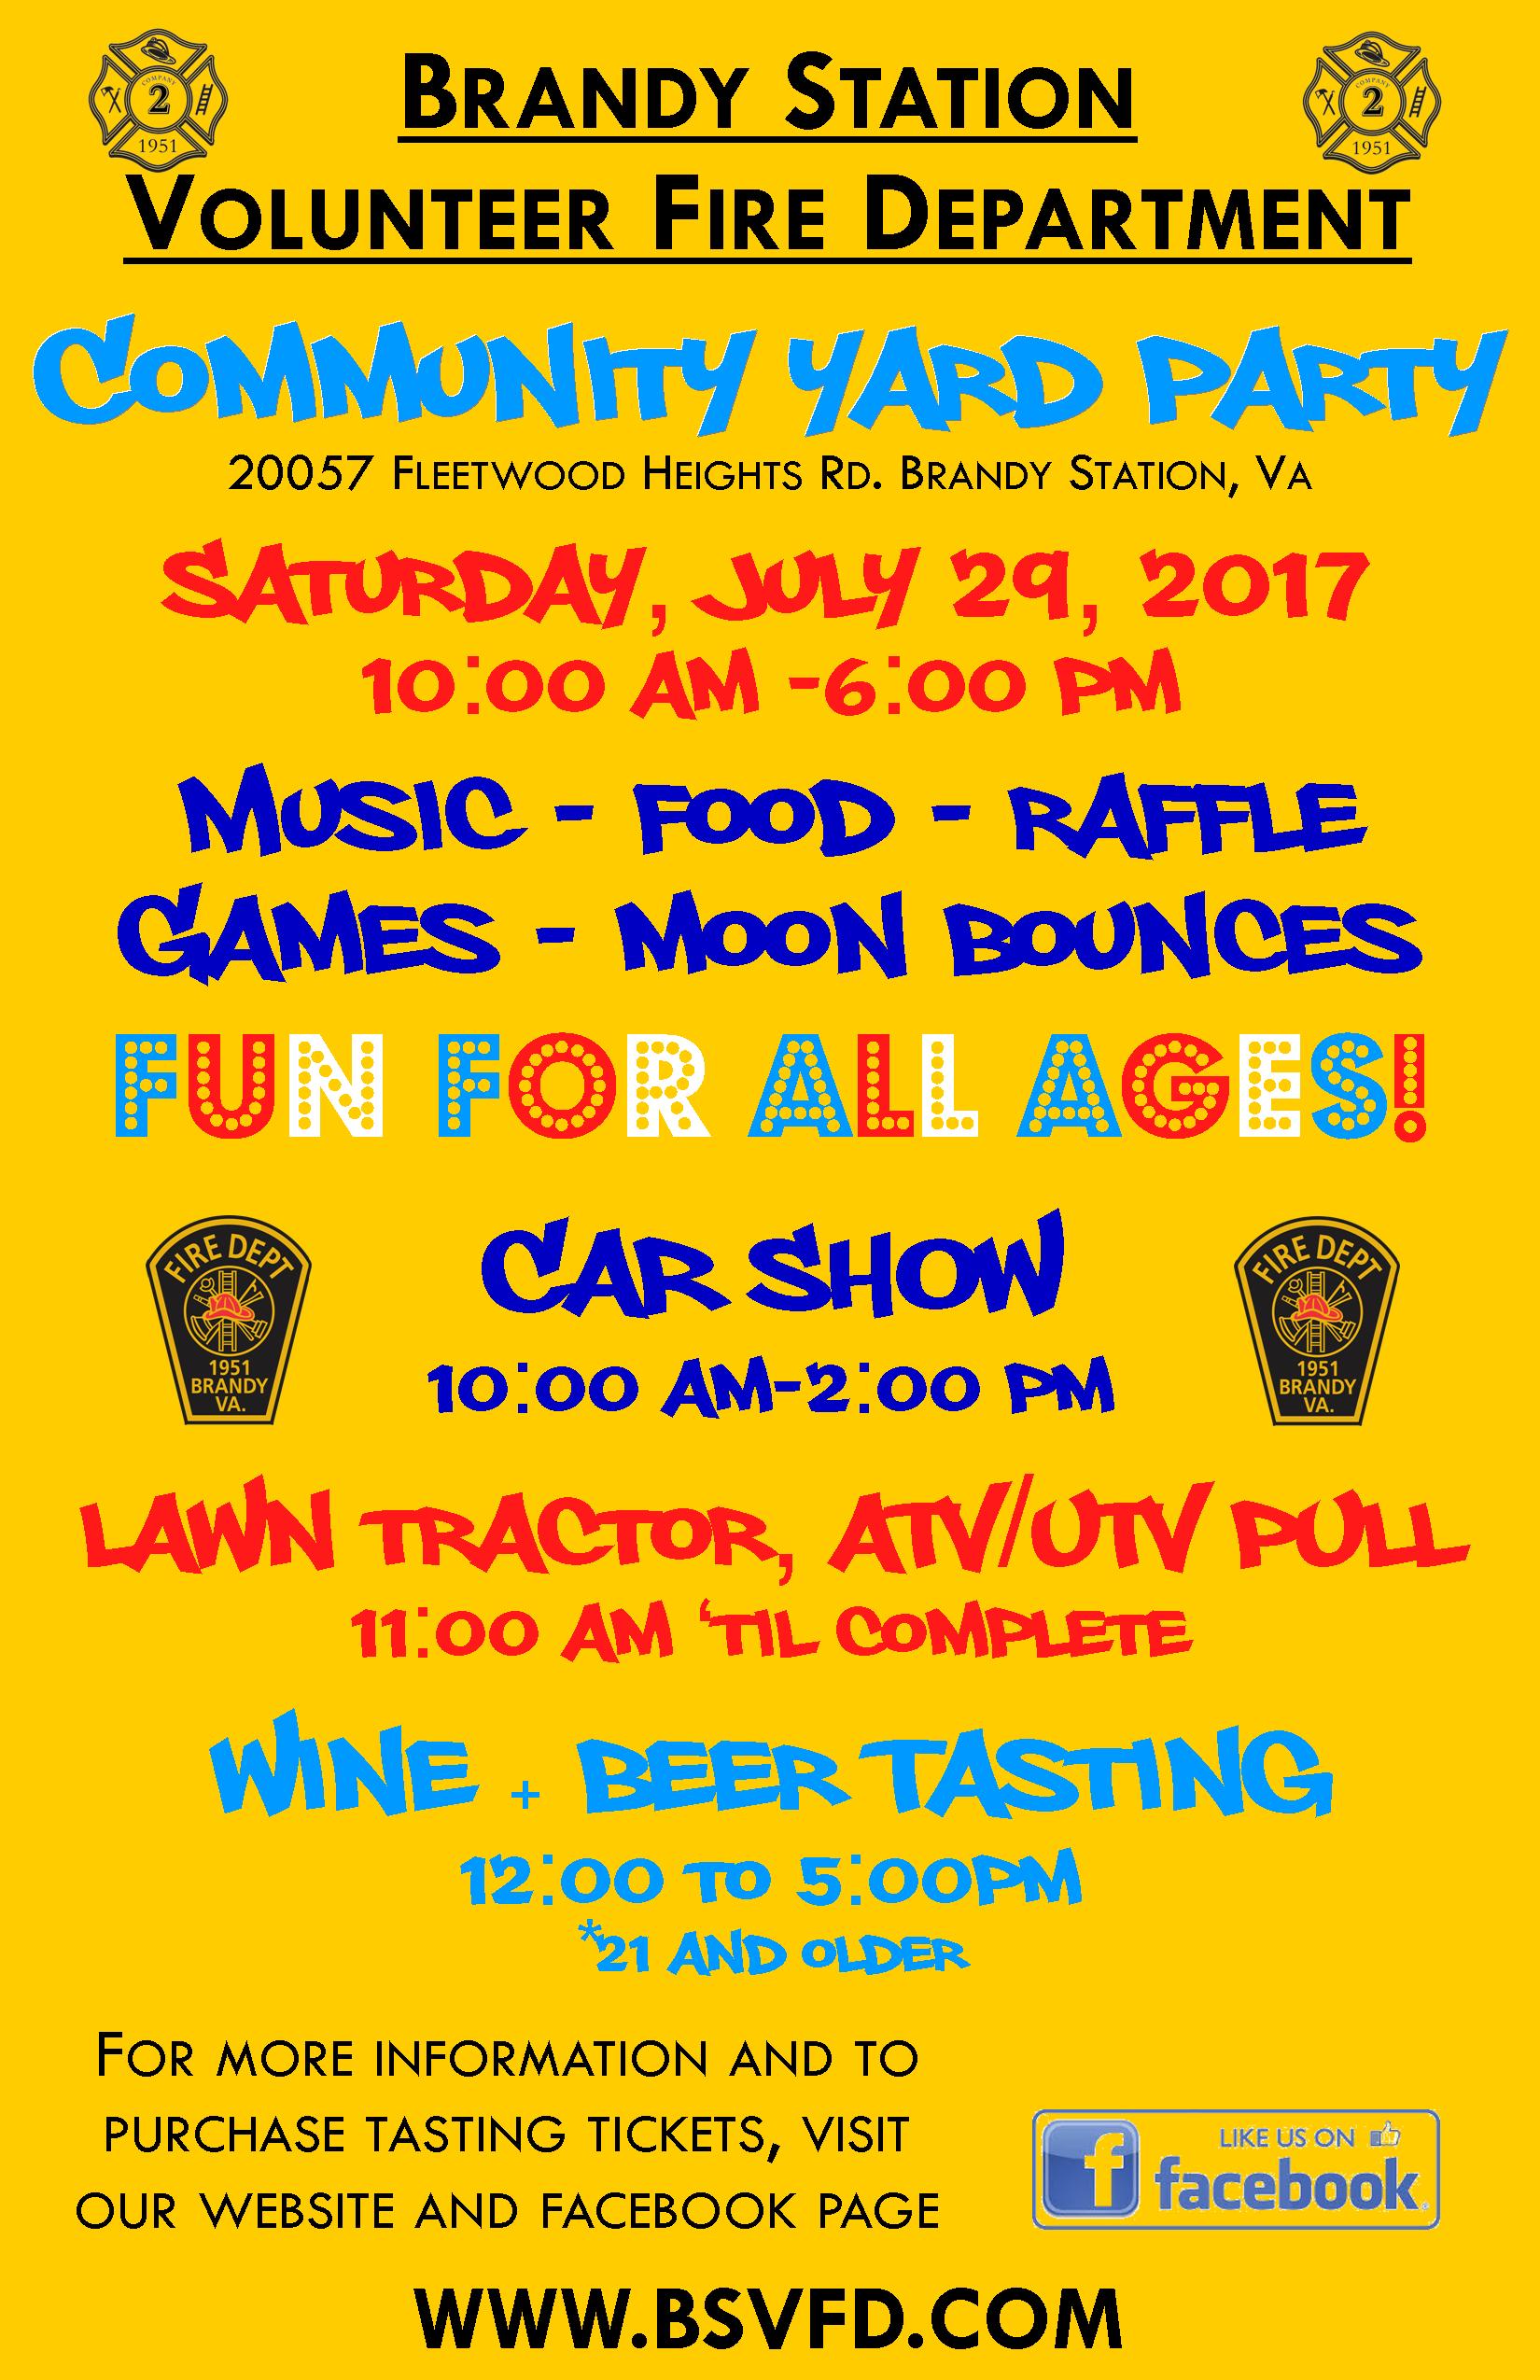 Community Yard Party Flyer